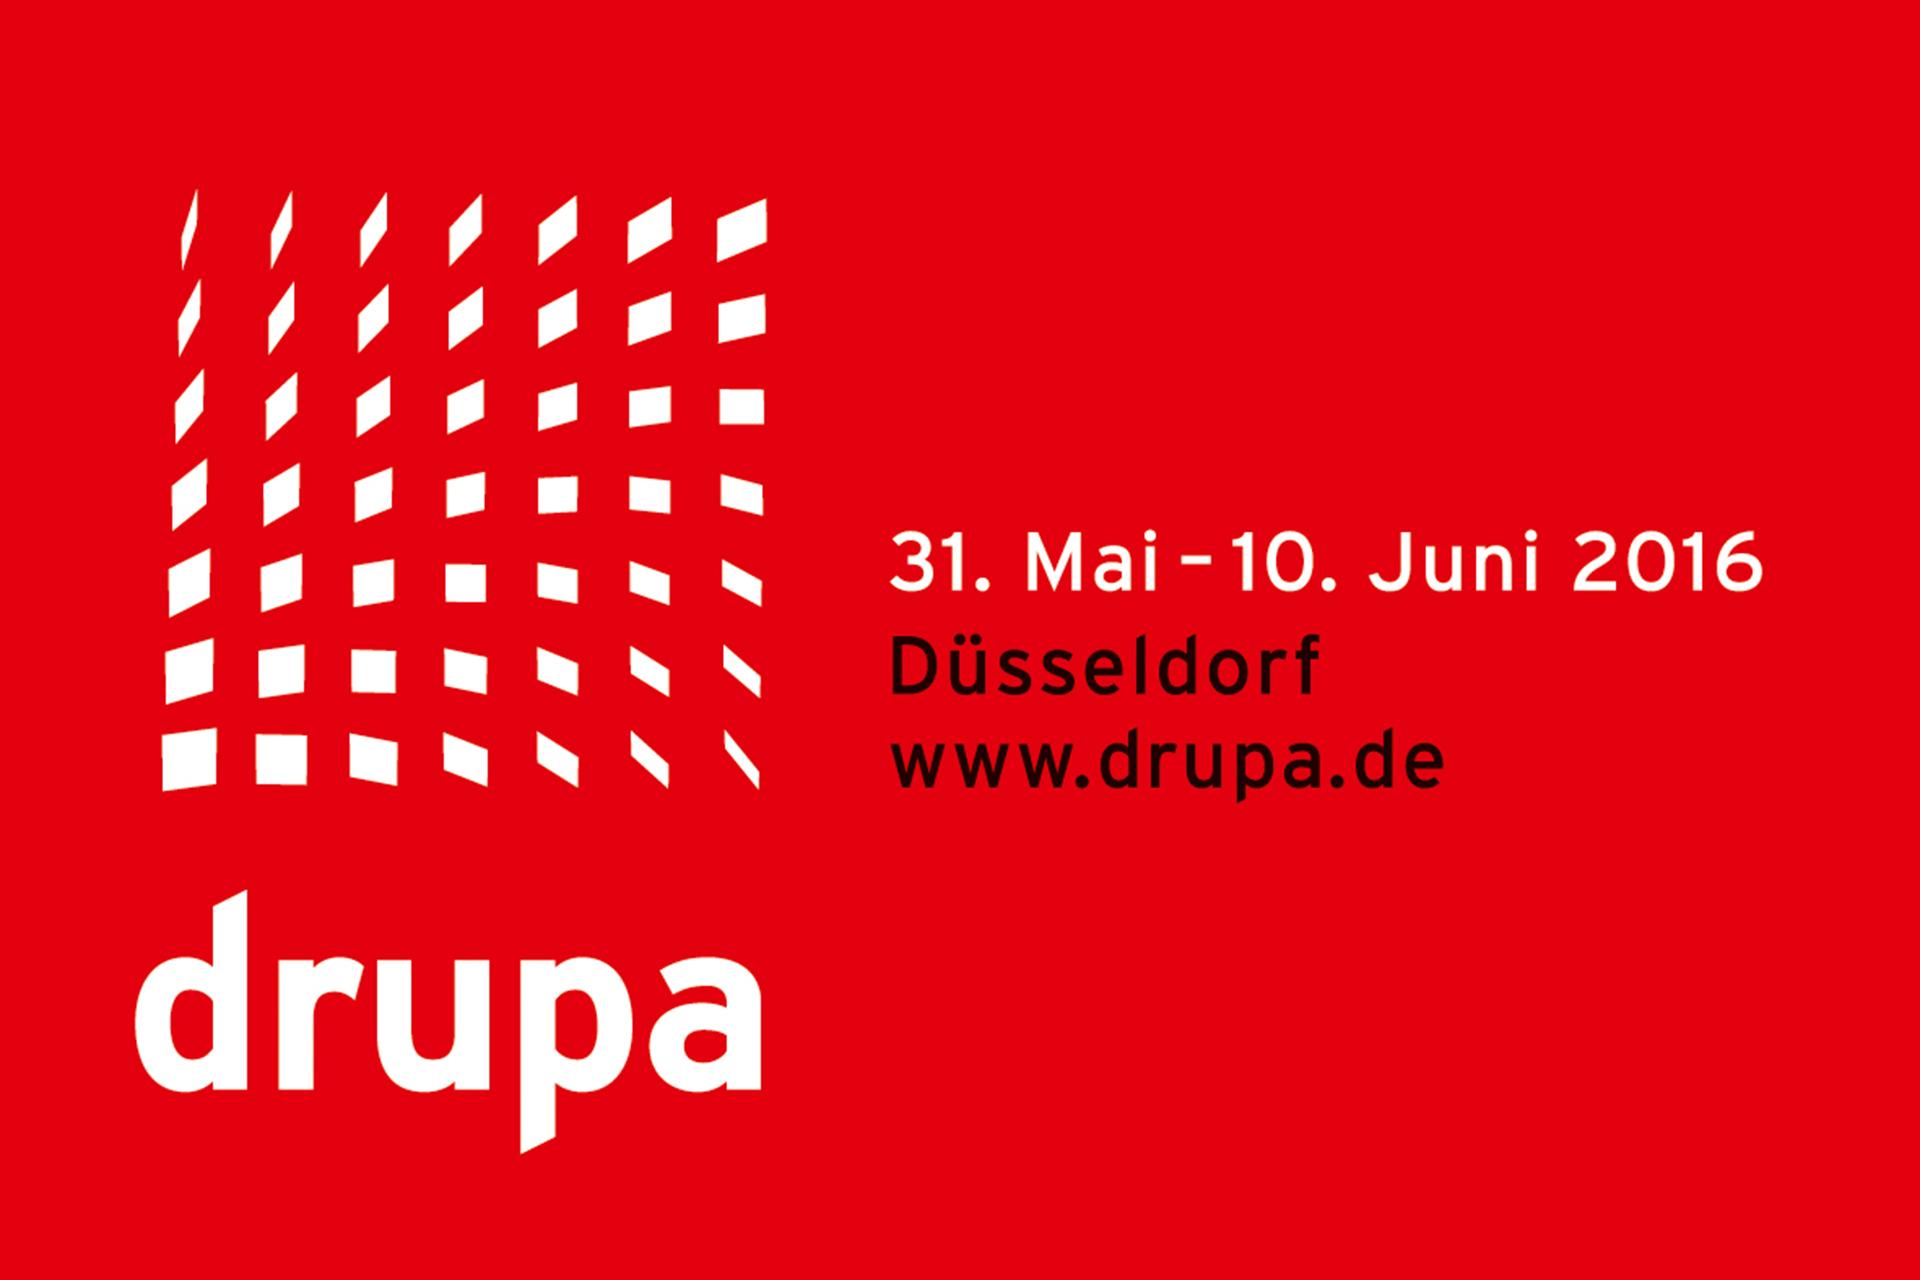 Drupa - weltgrößte Druckmesse